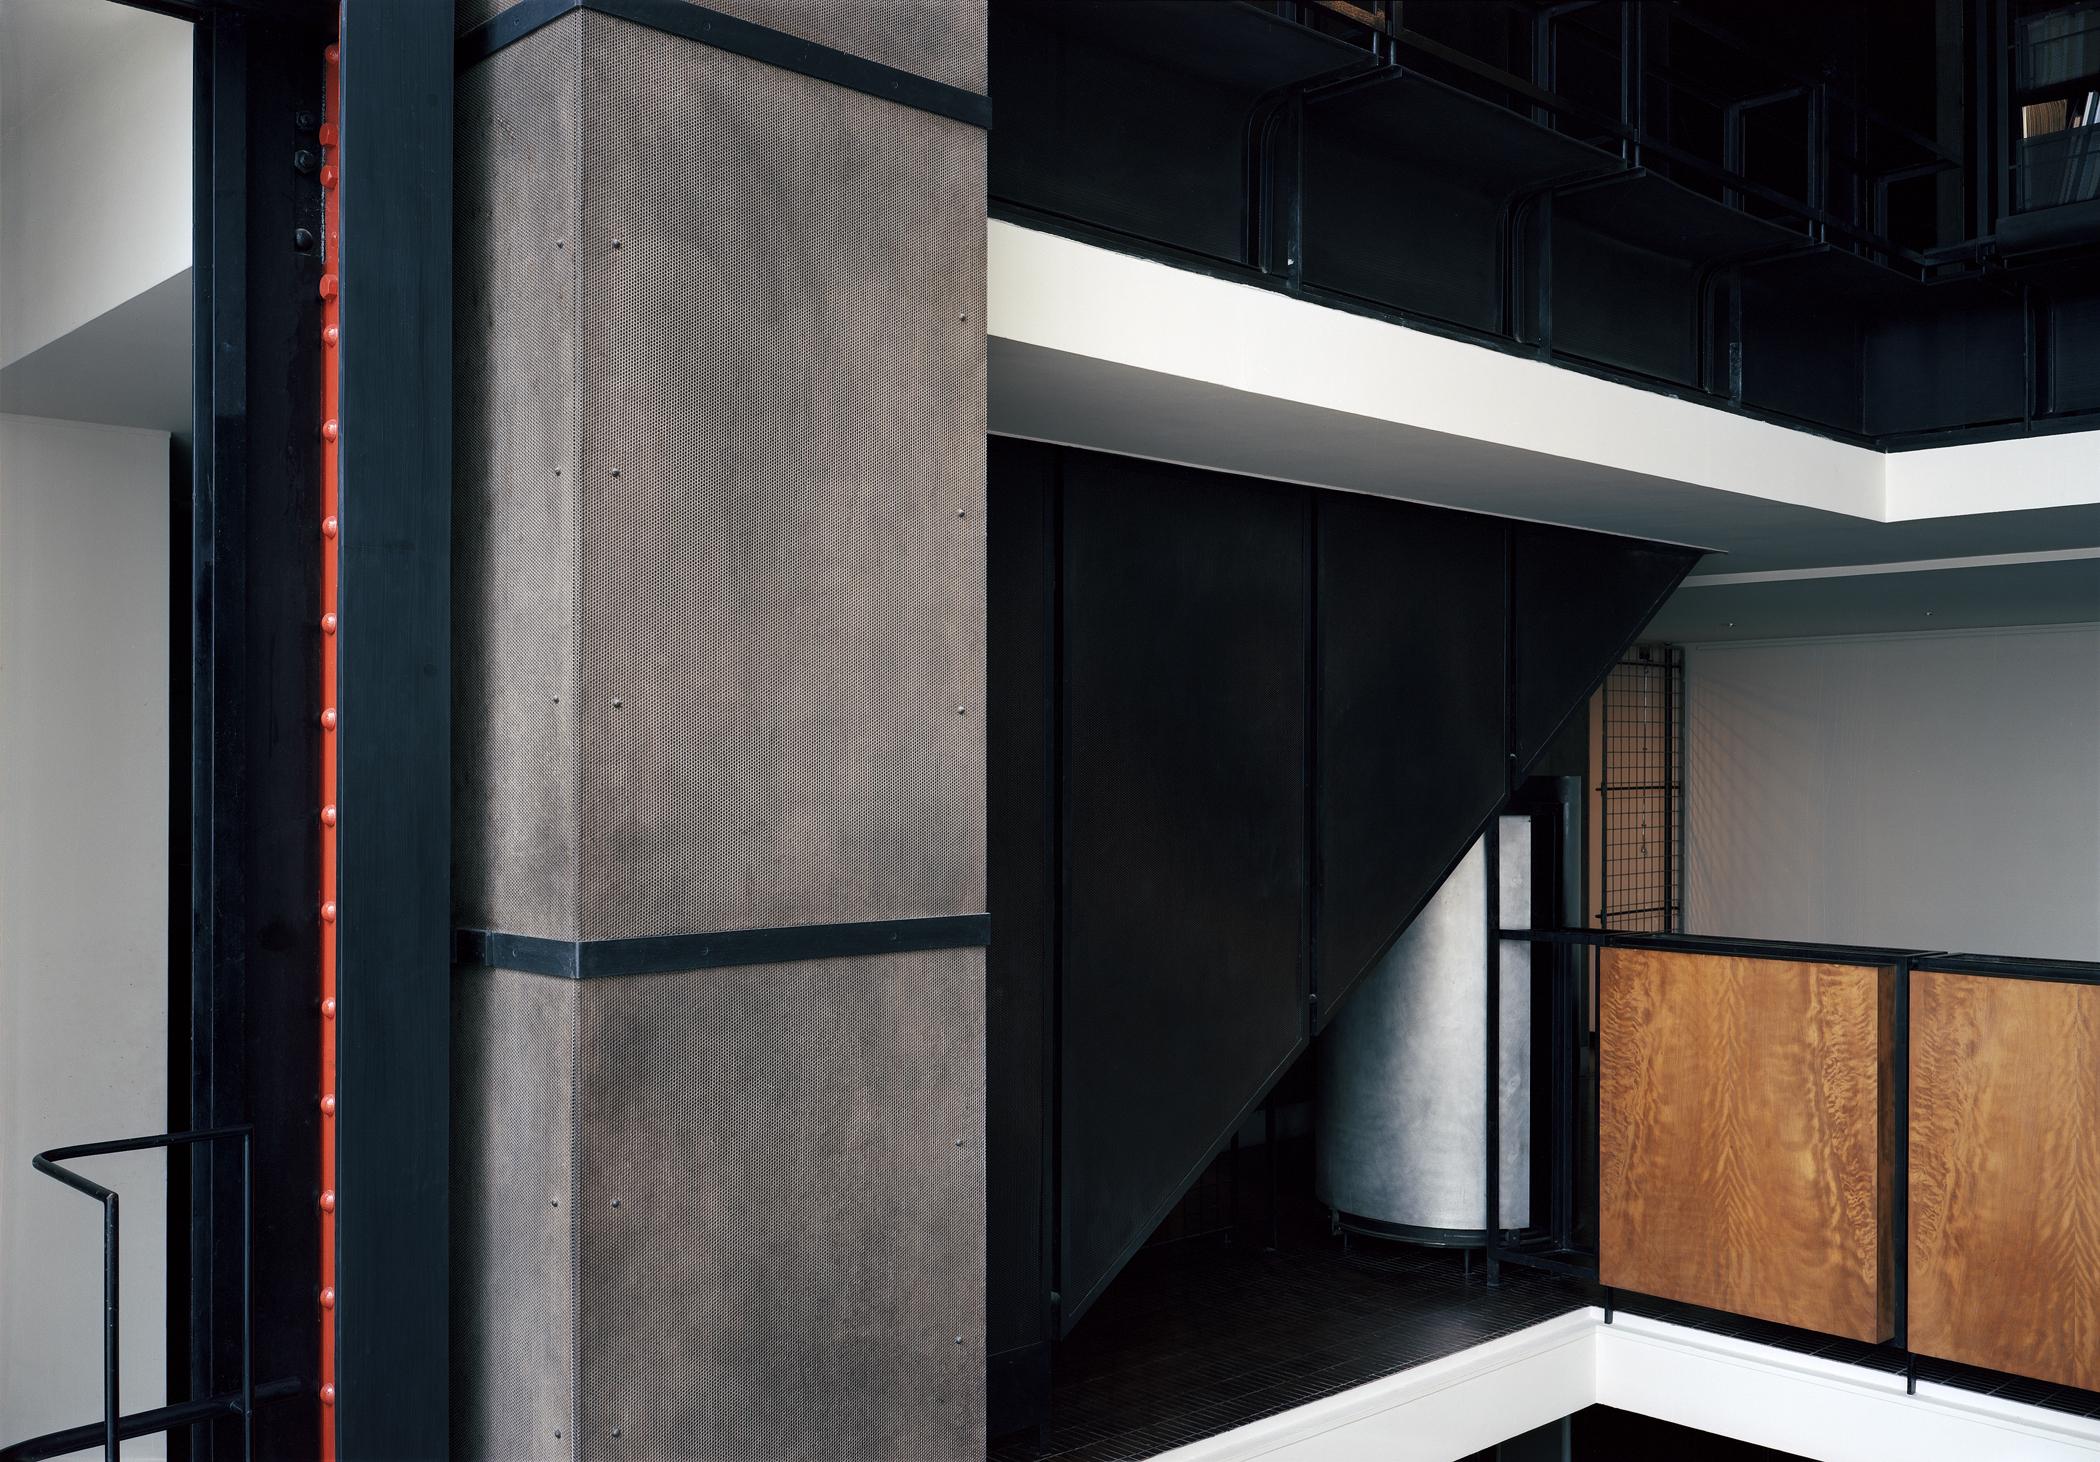 Adam Bartos, Gitterman Gallery